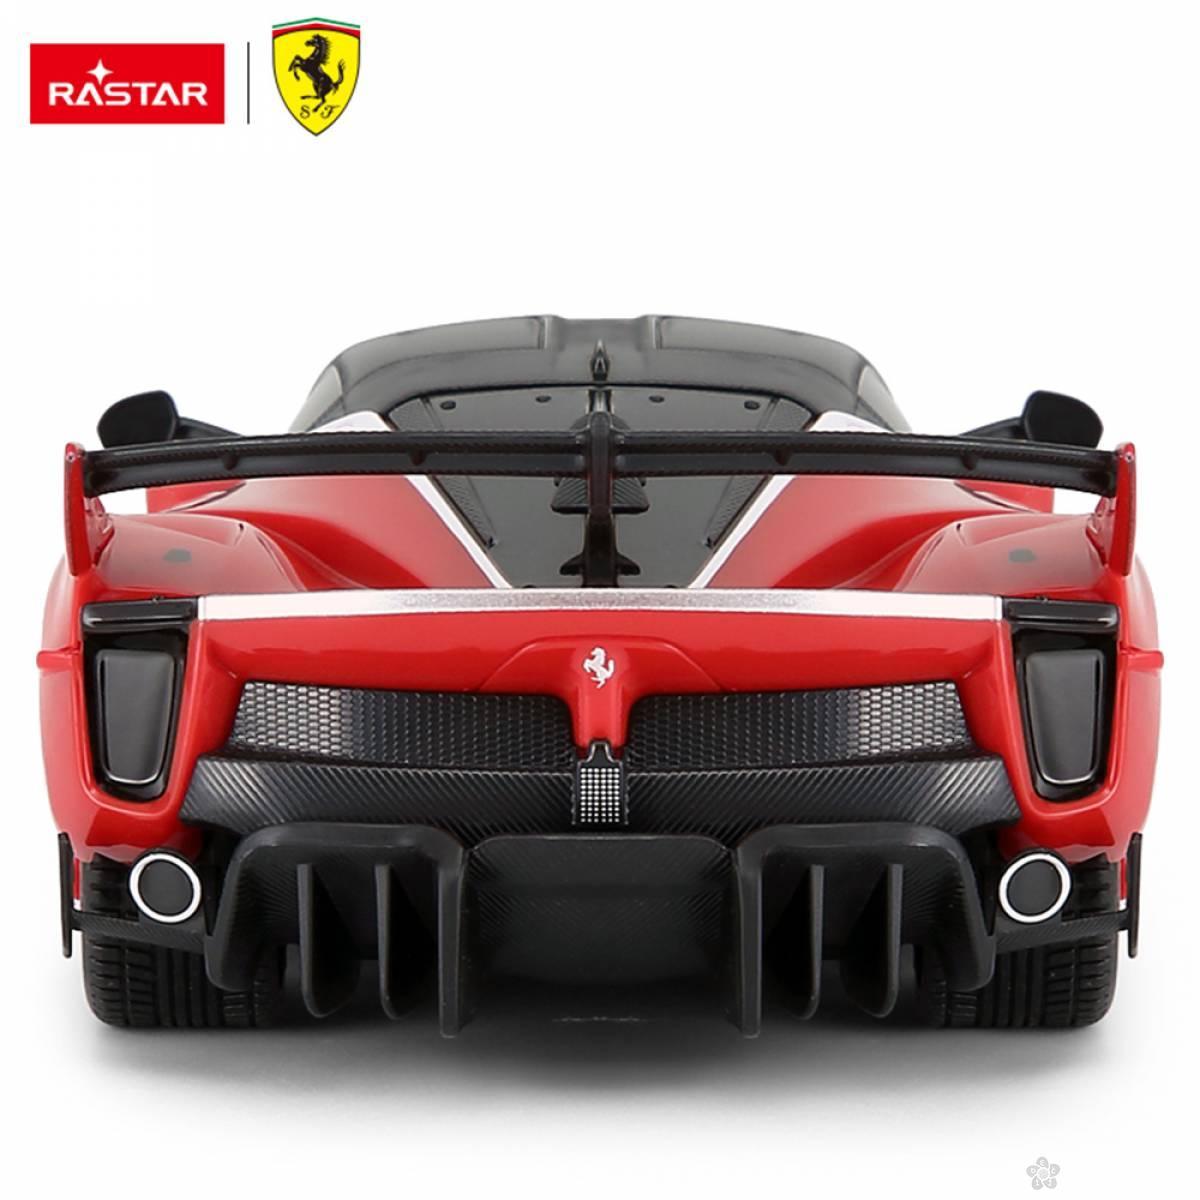 Rastar R/C Ferrari Evo 1:24 79300